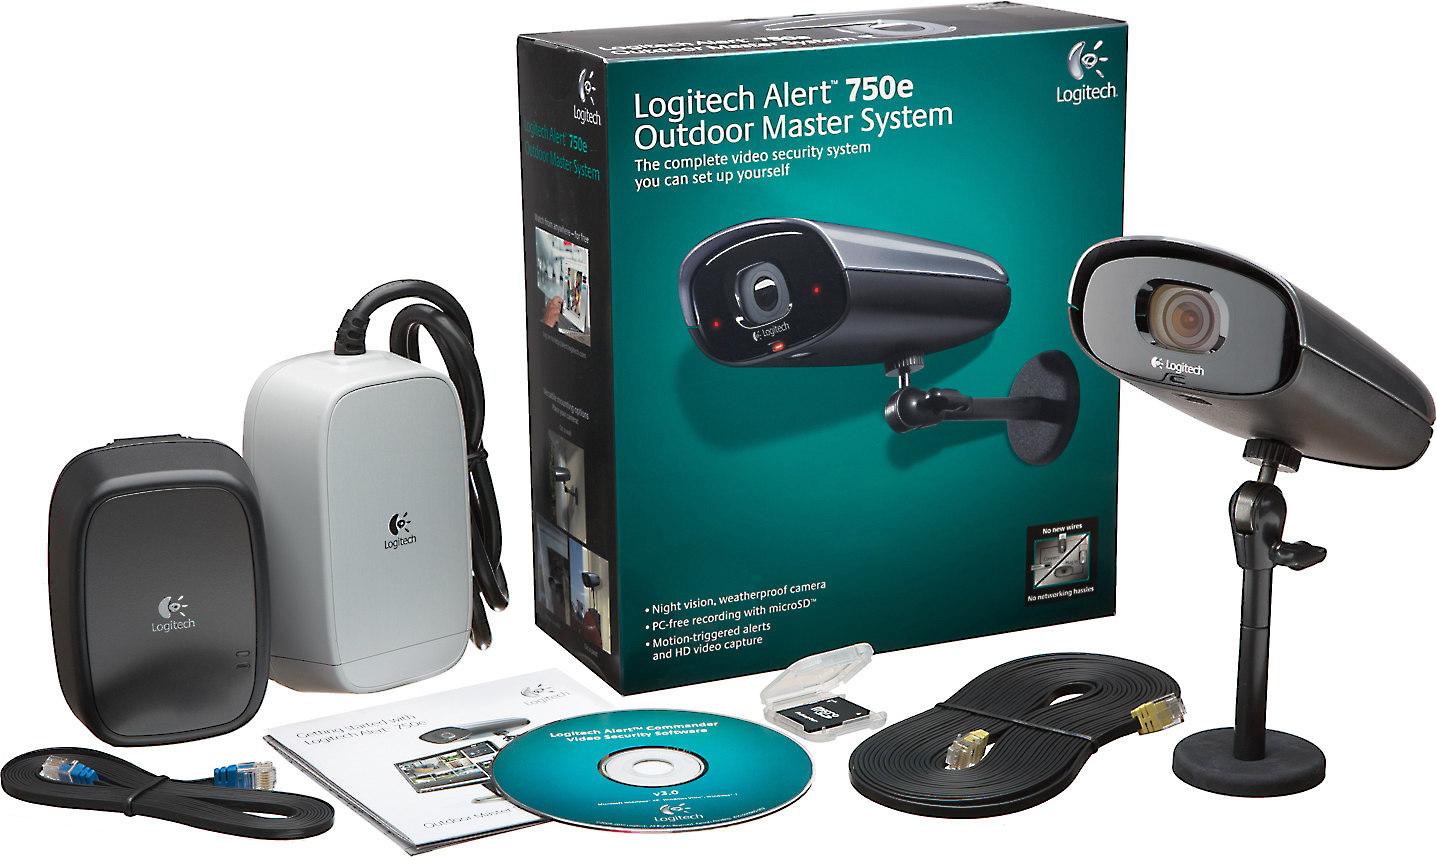 dd831059fc7 Logitech® Alert™ 750e Outdoor security camera system at Crutchfield